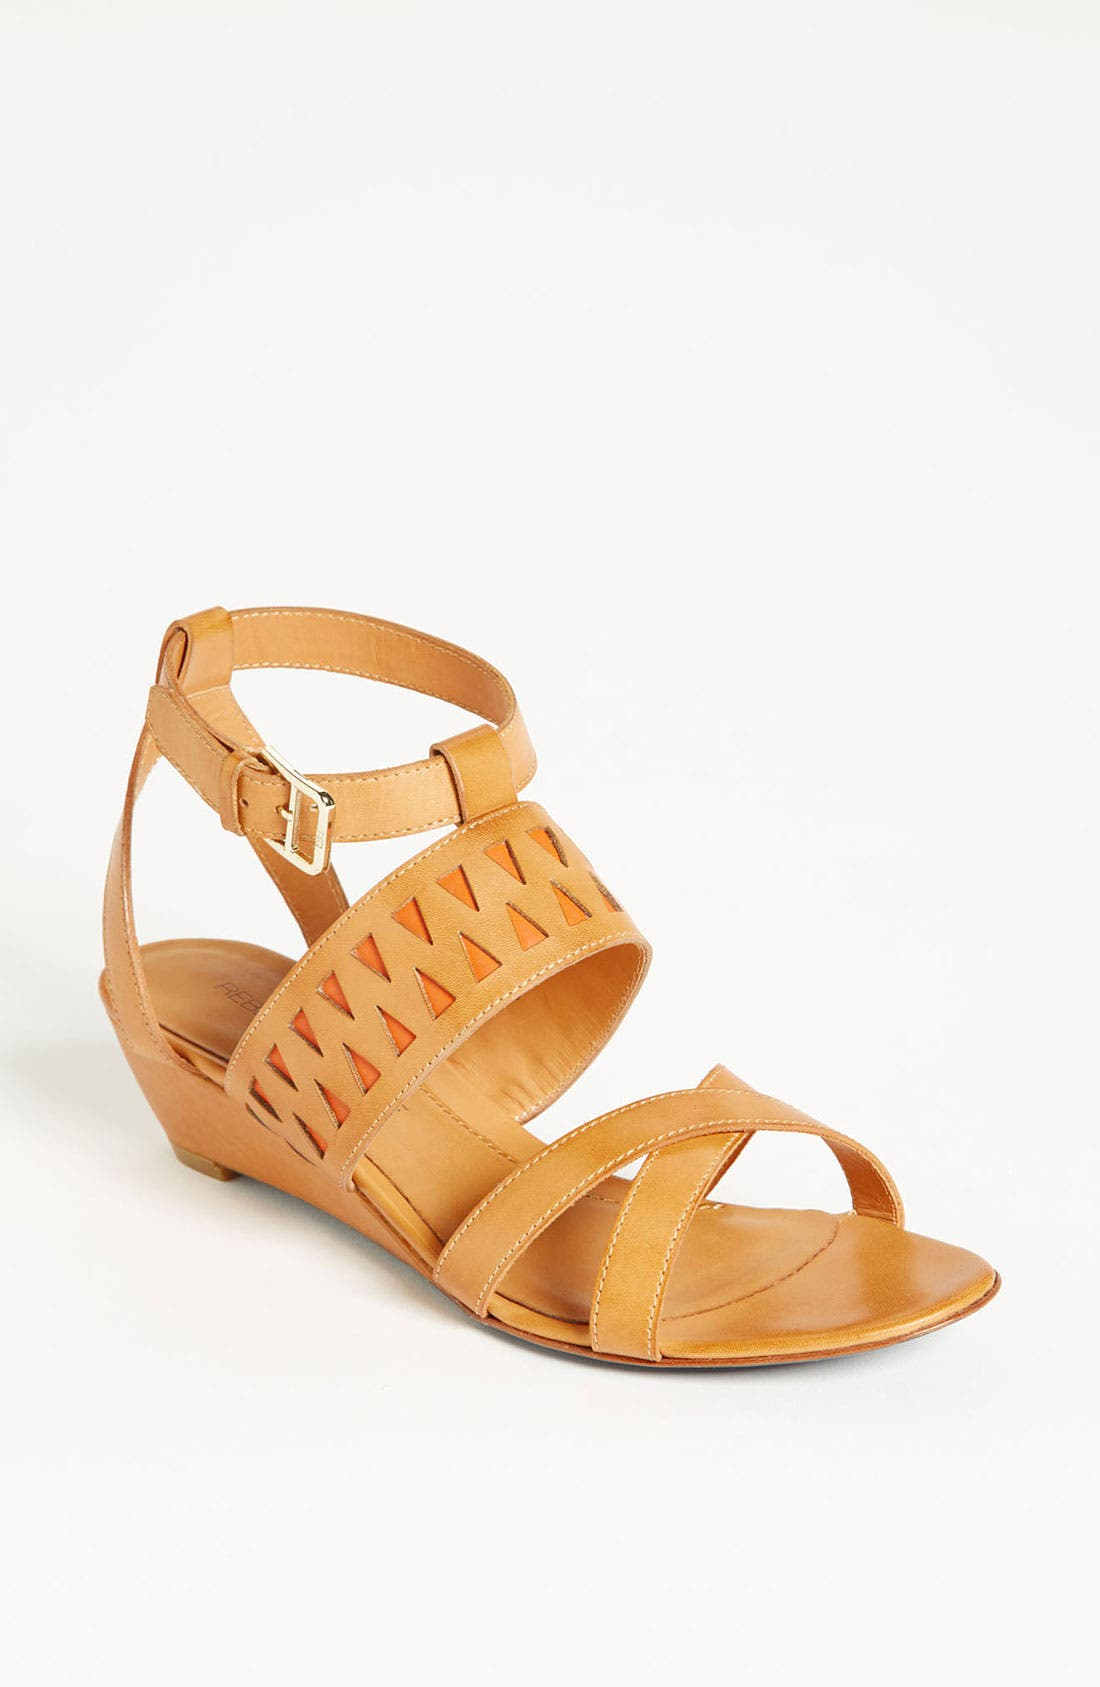 Main Image - Rebecca Minkoff 'Lupe' Sandal